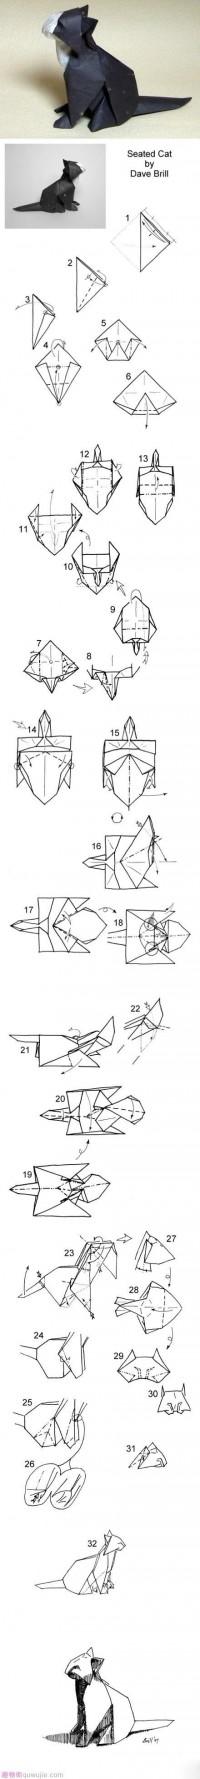 Origami Seated Cat Folding Instructions | Origami Instruction